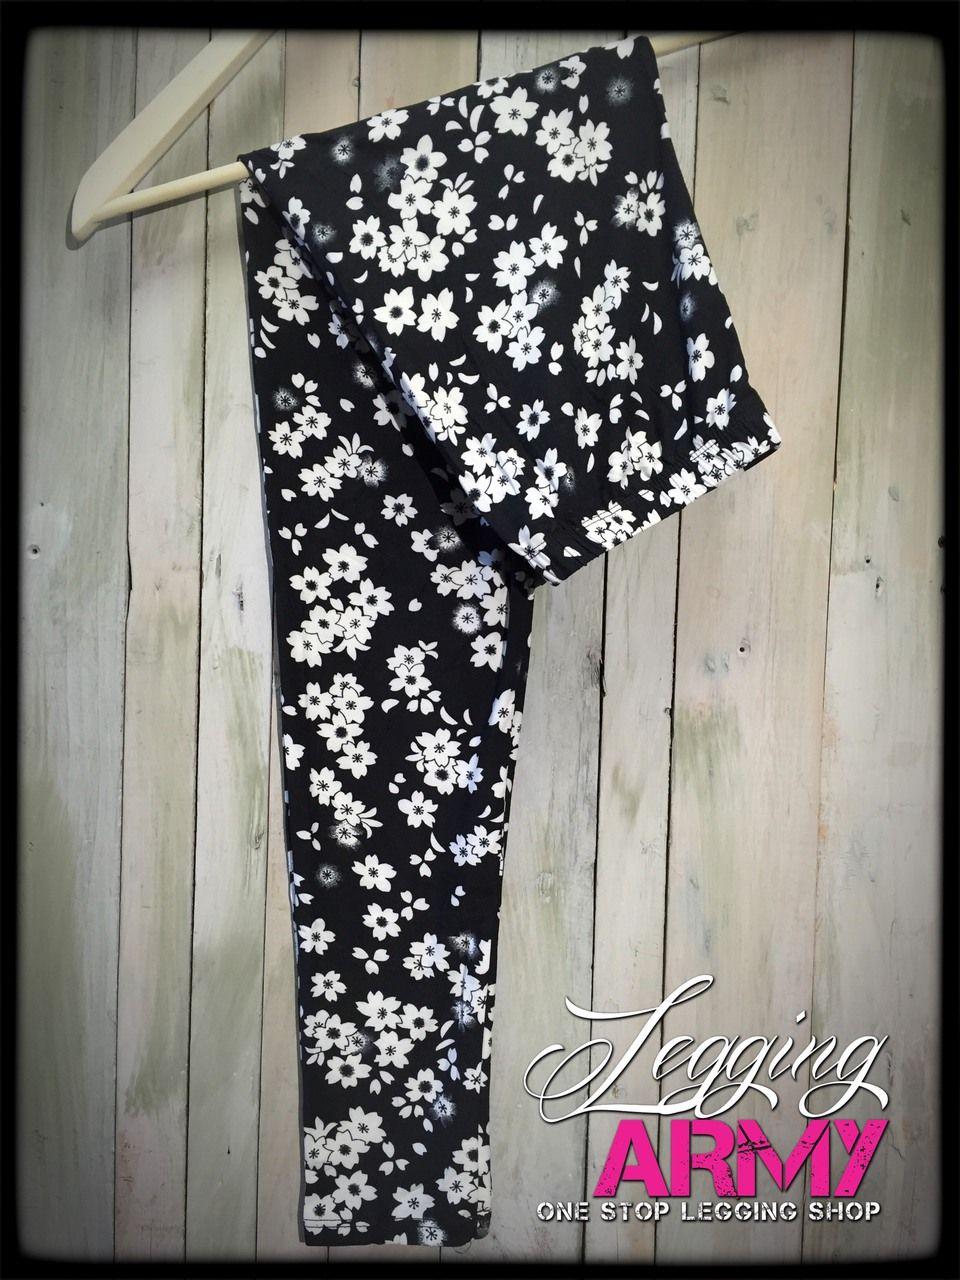 Frosted Flower - Legging Army. http://leggingarmy.com/#leggingdeals